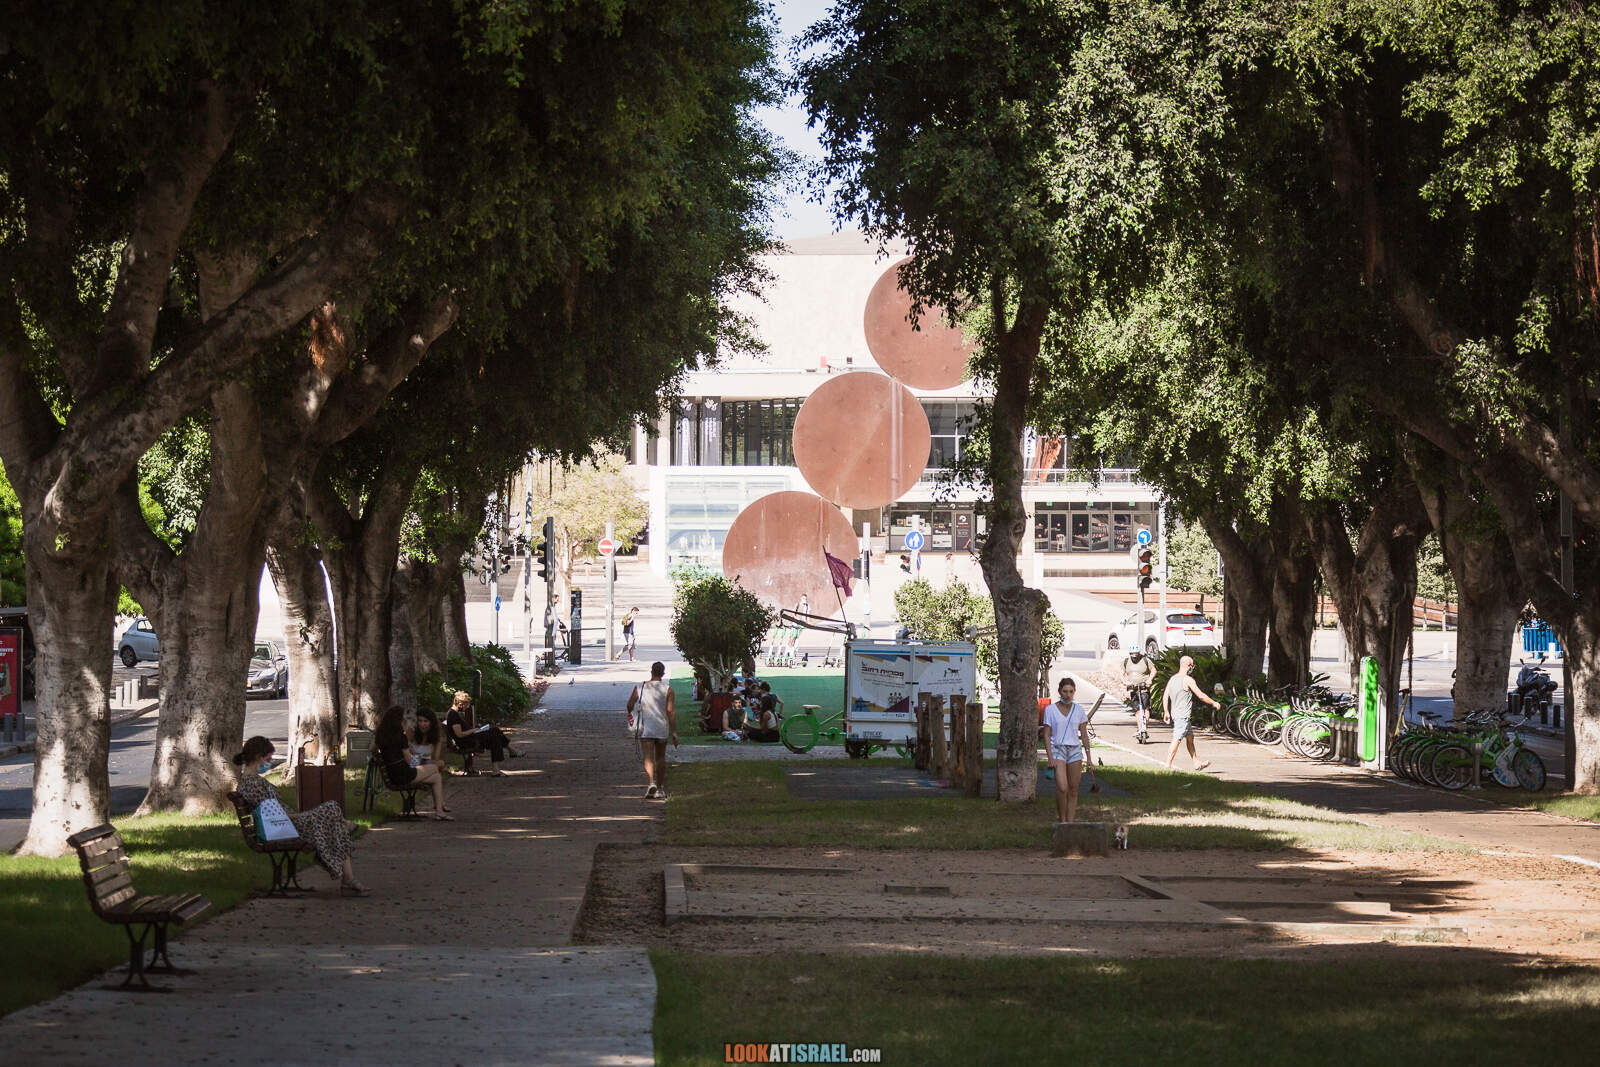 Тель-Авив, бульвар Ротшильд и театр Габими во время карантина   Lockdown on beaches of Tel Aviv   LookAtIsrael.com - Фото путешествия по Израилю